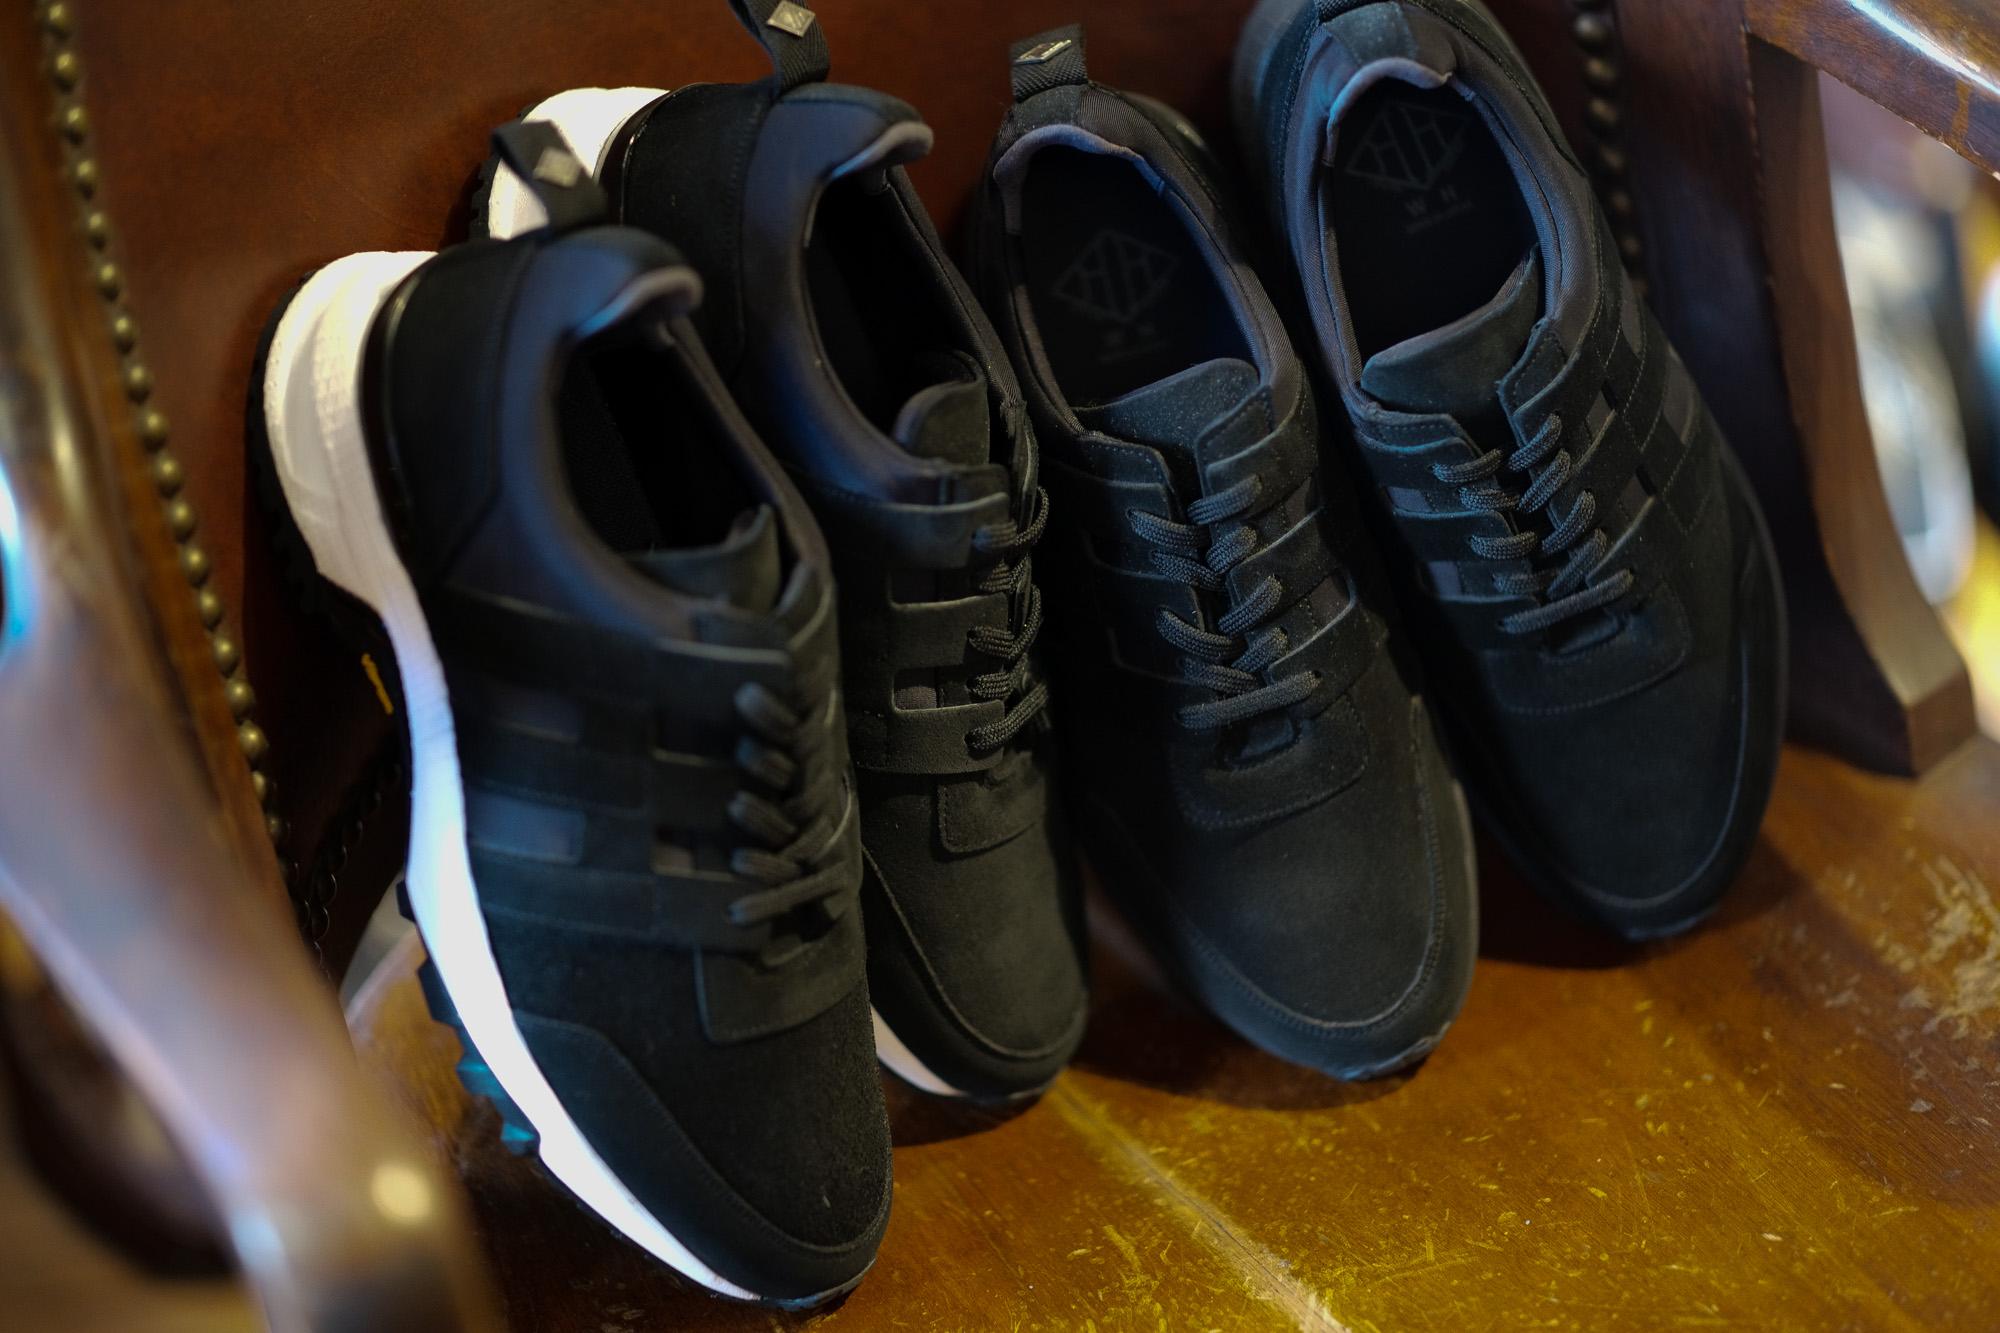 WH (ダブルエイチ) WH-0111S Faster Last(ファスターラスト) Suede Leather スエードレザー スニーカー BLACK×WHITE (ブラック×ホワイト),BLACK×BLACK (ブラック×ブラック)  MADE IN JAPAN (日本製) 2020【Alto e Diritto 別注 限定スエードモデル】愛知 名古屋 alto e diritto altoediritto アルトエデリット